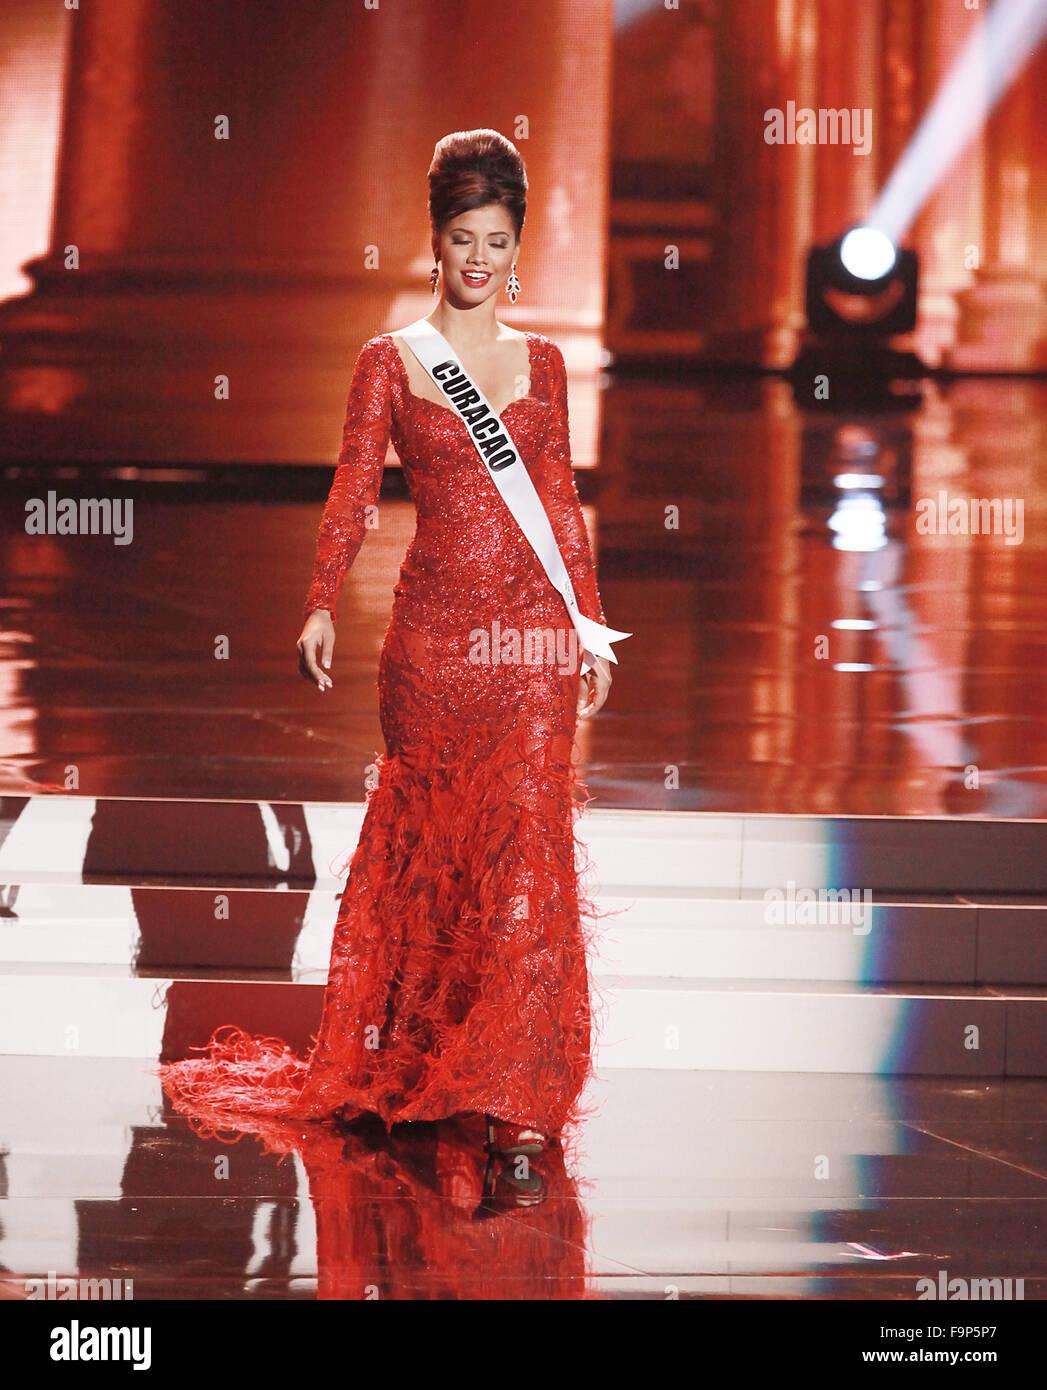 Miss Curacao 2015 Stock Photos & Miss Curacao 2015 Stock Images - Alamy